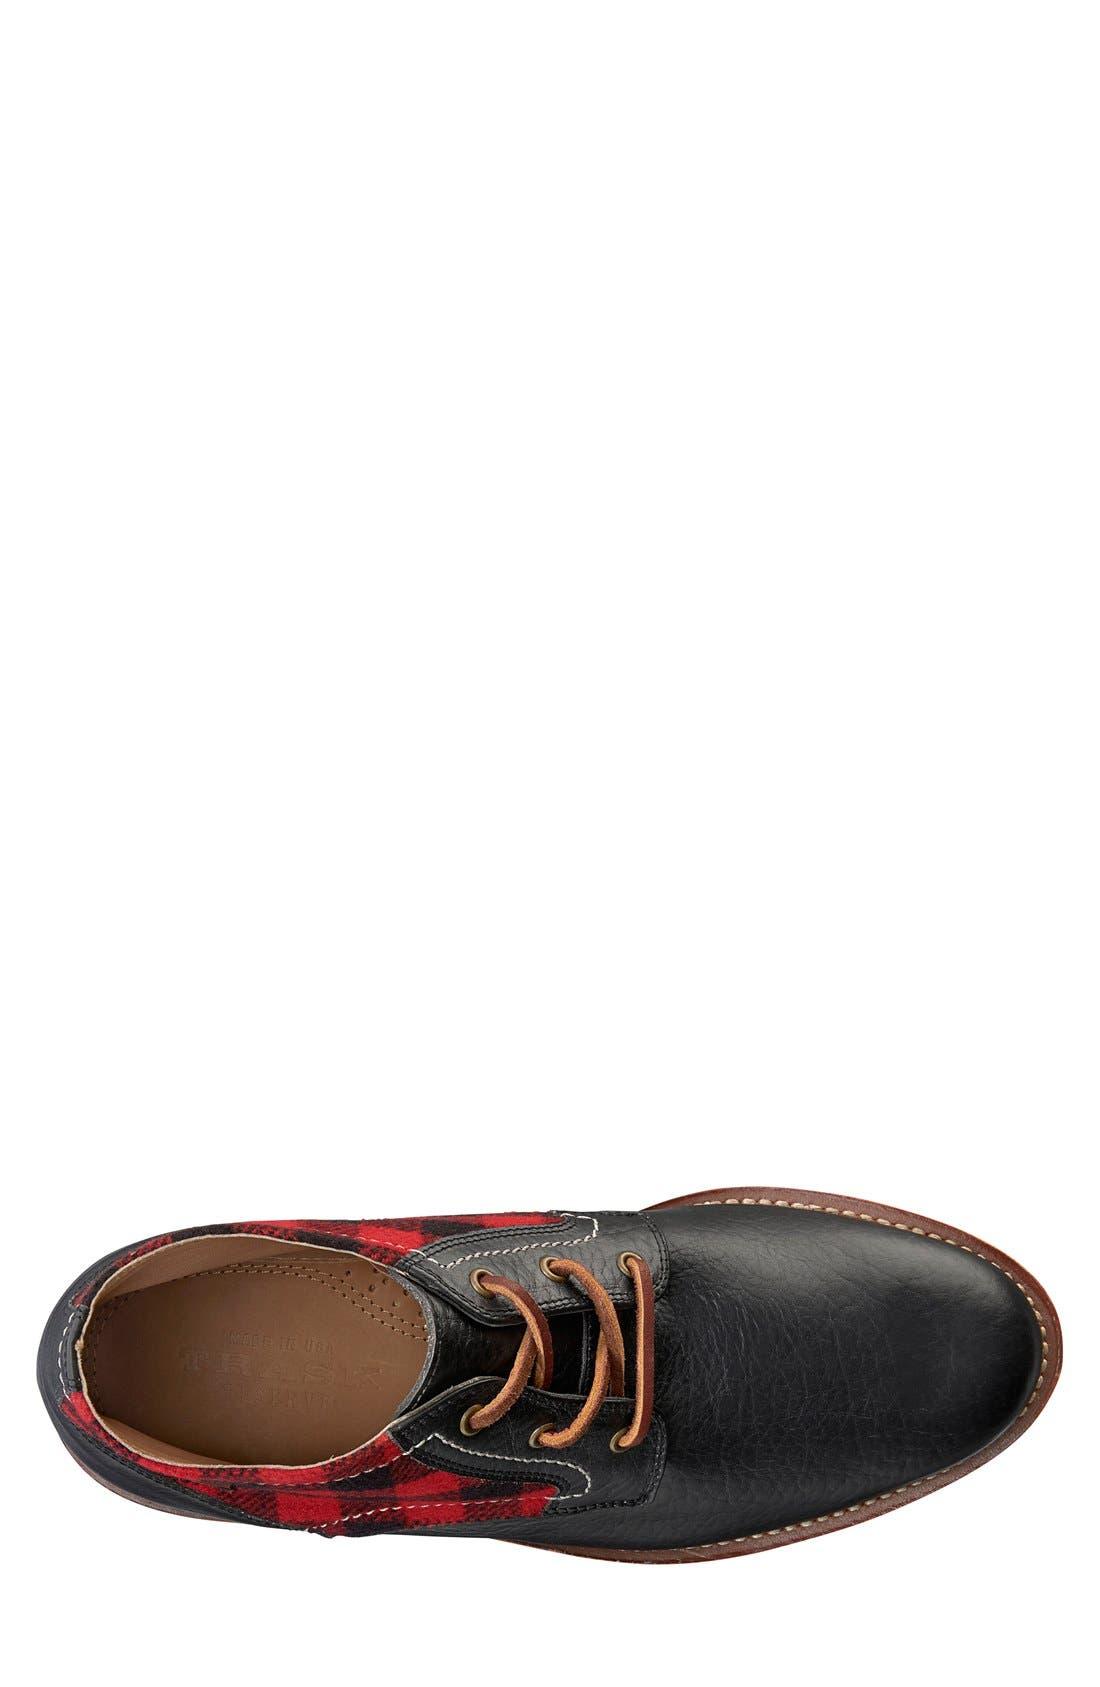 'Bighorn' Plain Toe Boot,                             Alternate thumbnail 8, color,